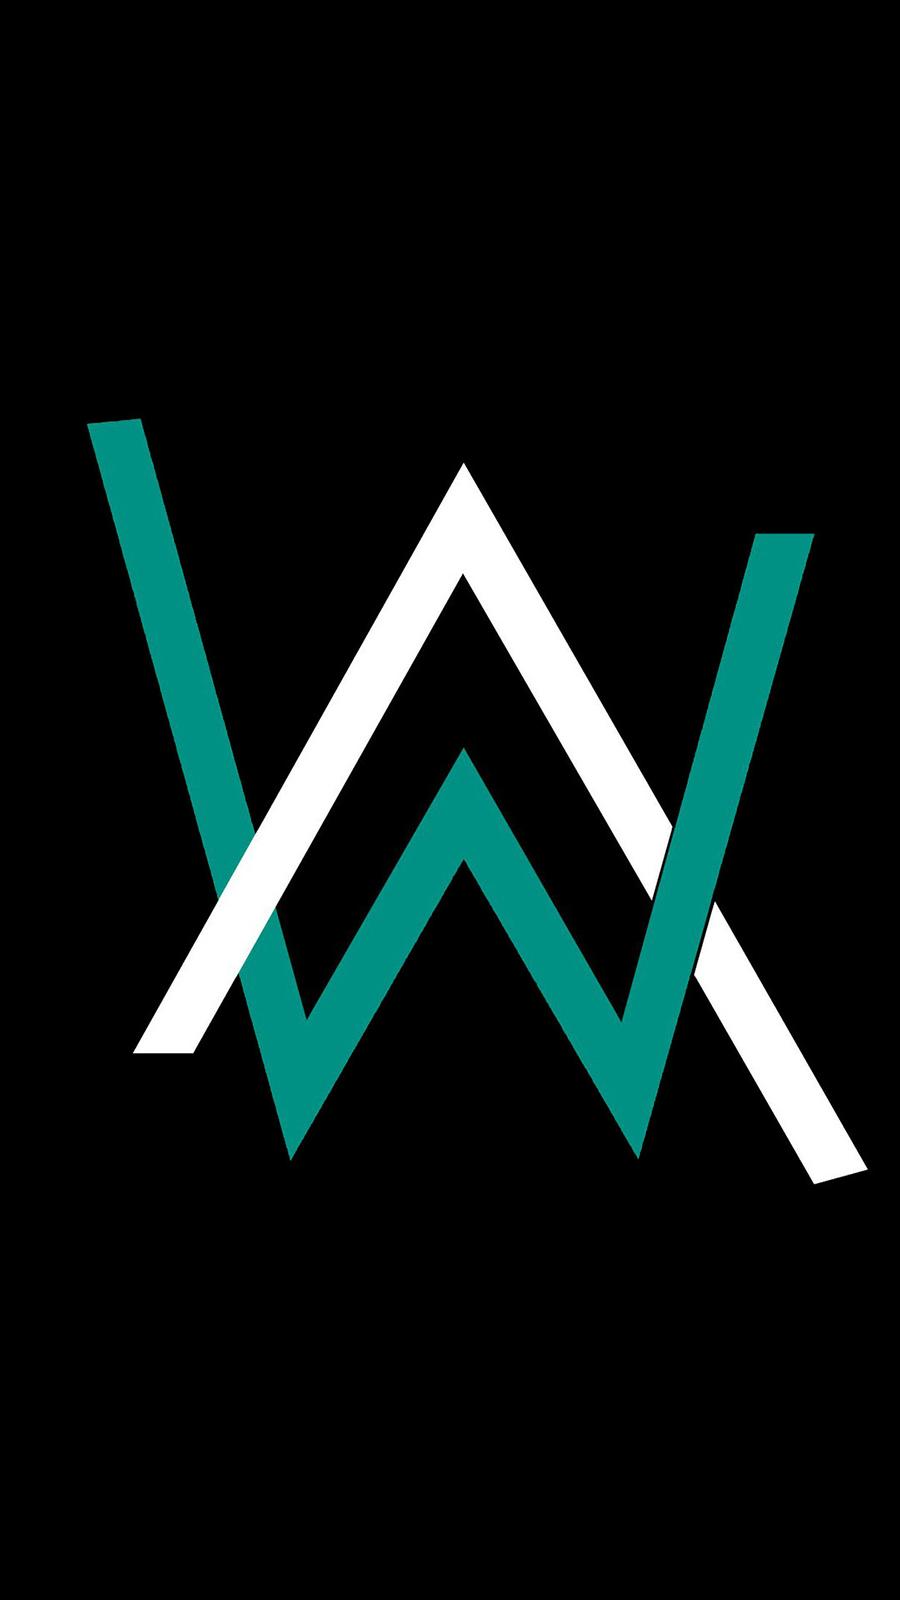 Alan Walker Logo Qhd Wallpaper